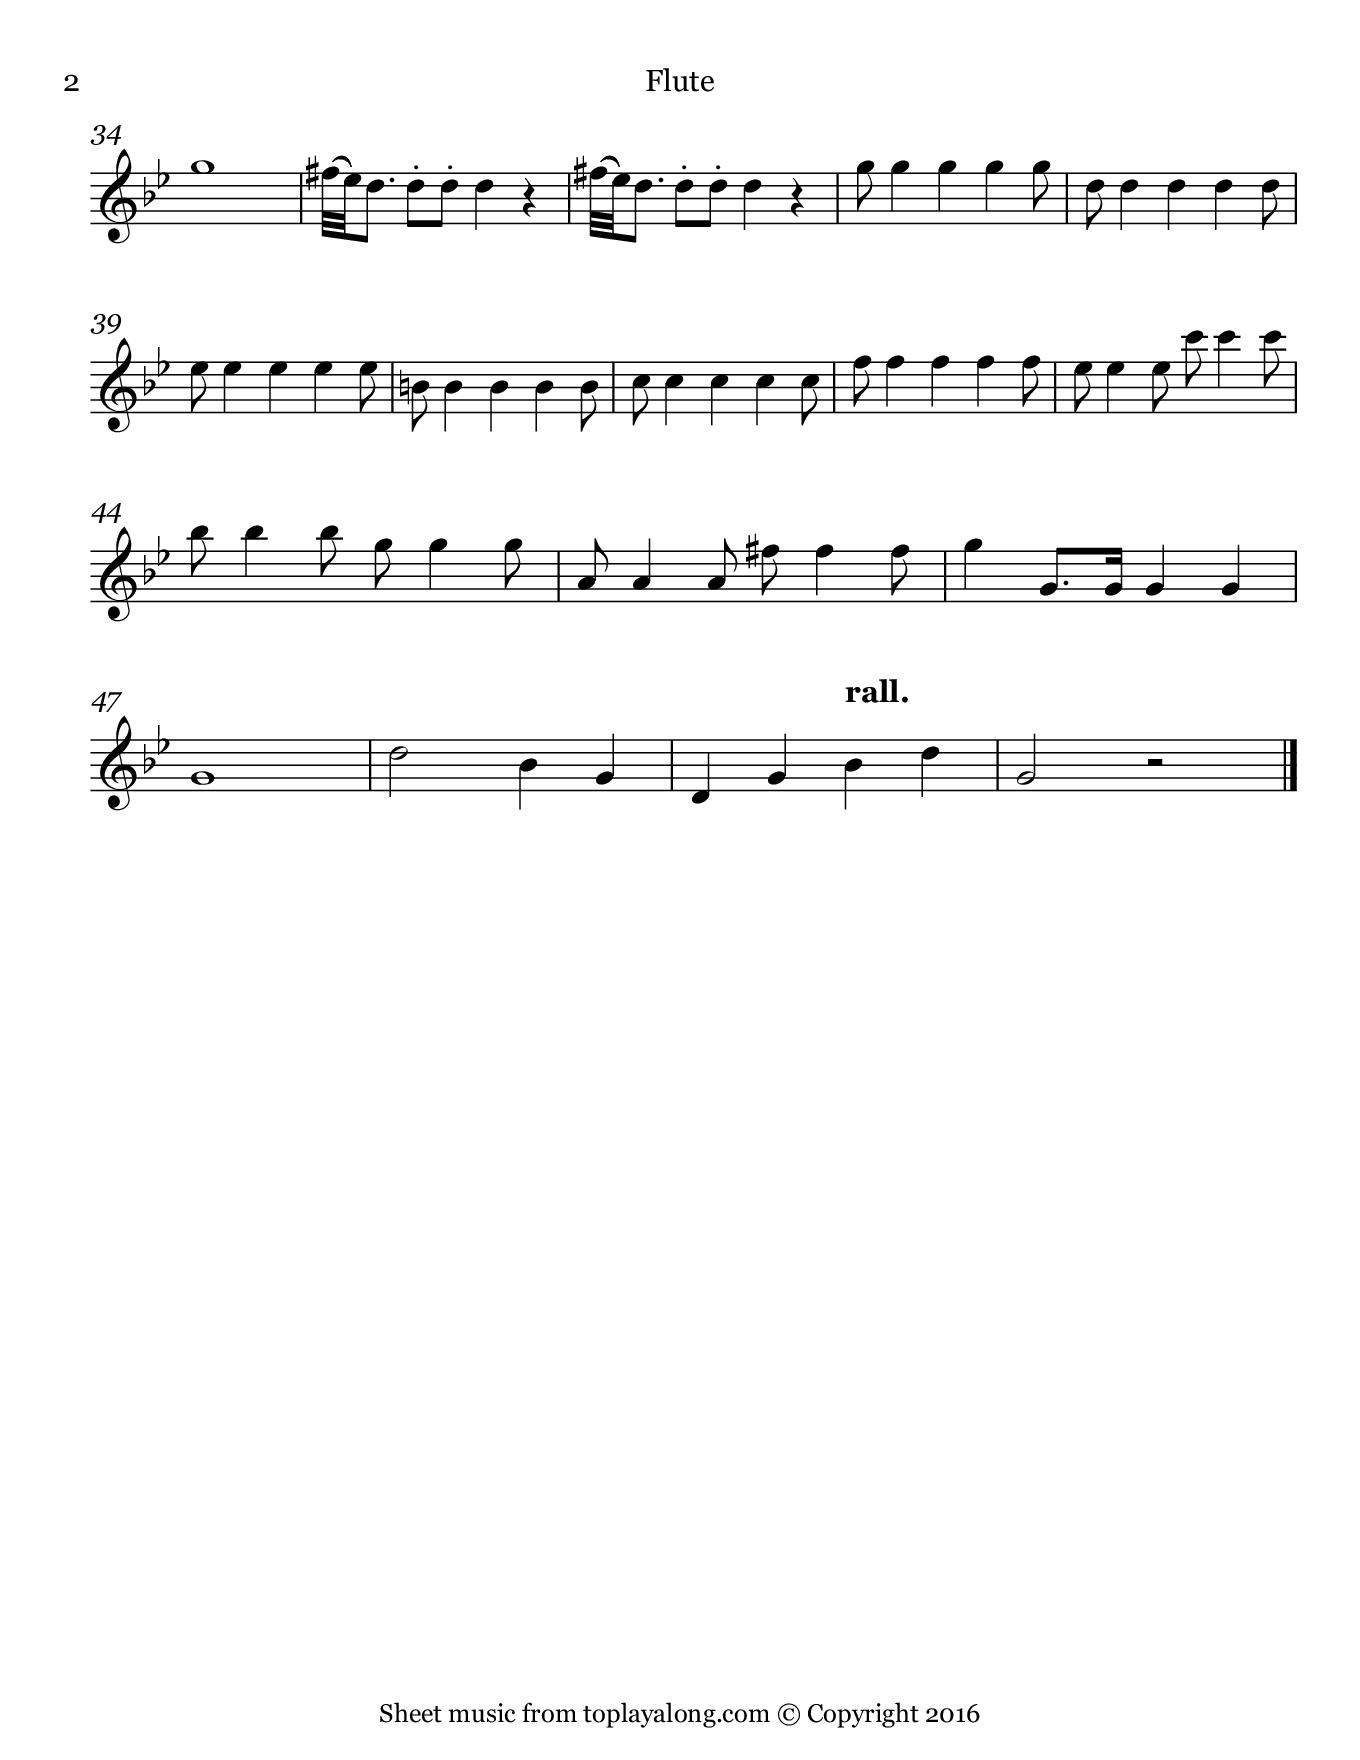 Symphony No 25 In G Minor K 183 Theme By Mozart Sheet Music For Flute Page 2 G Minor Sheet Music Mozart